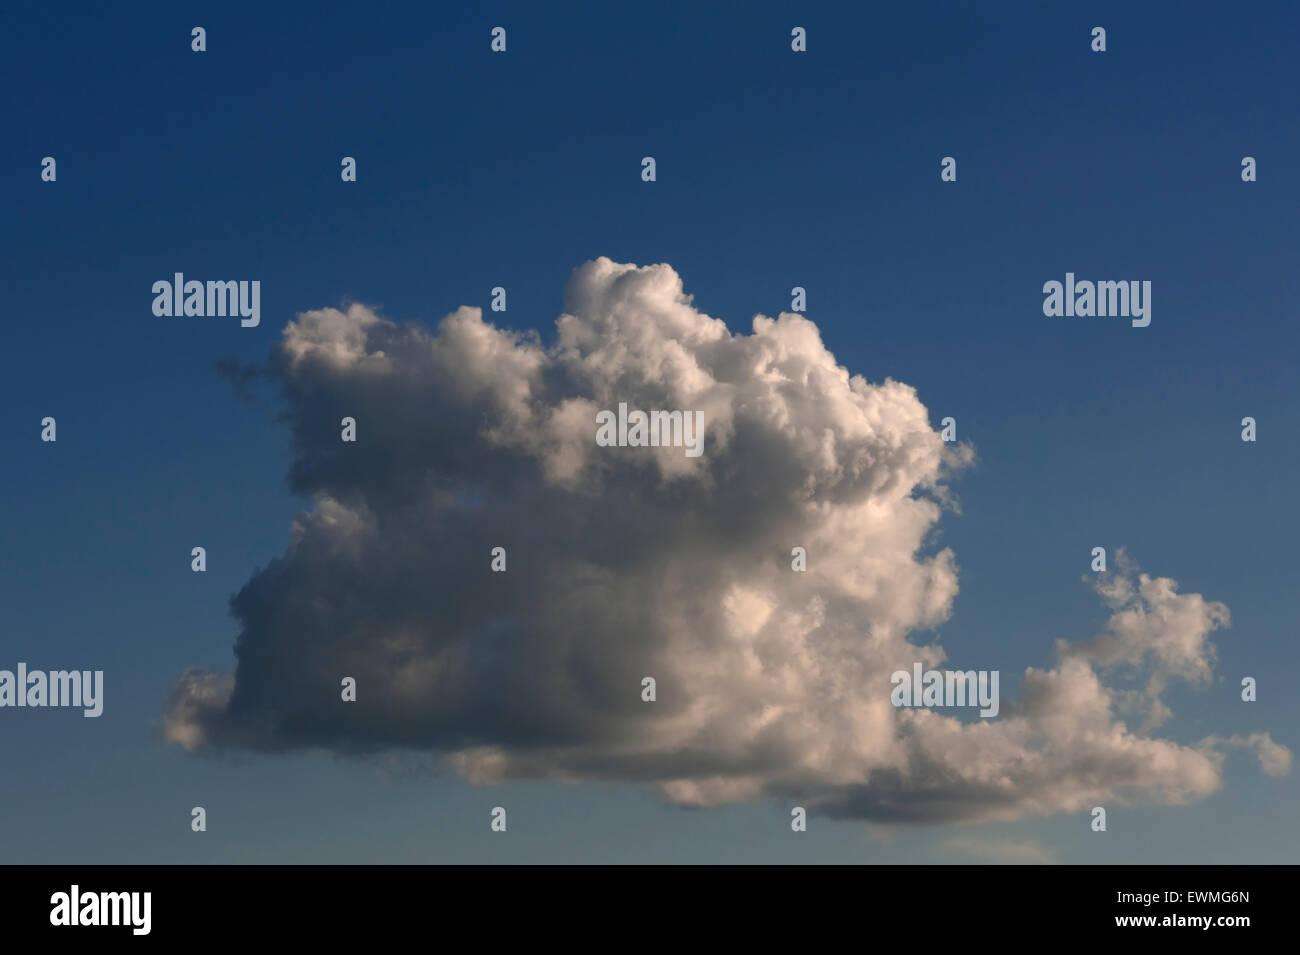 Rain cloud, Nimbostratus, Germany - Stock Image